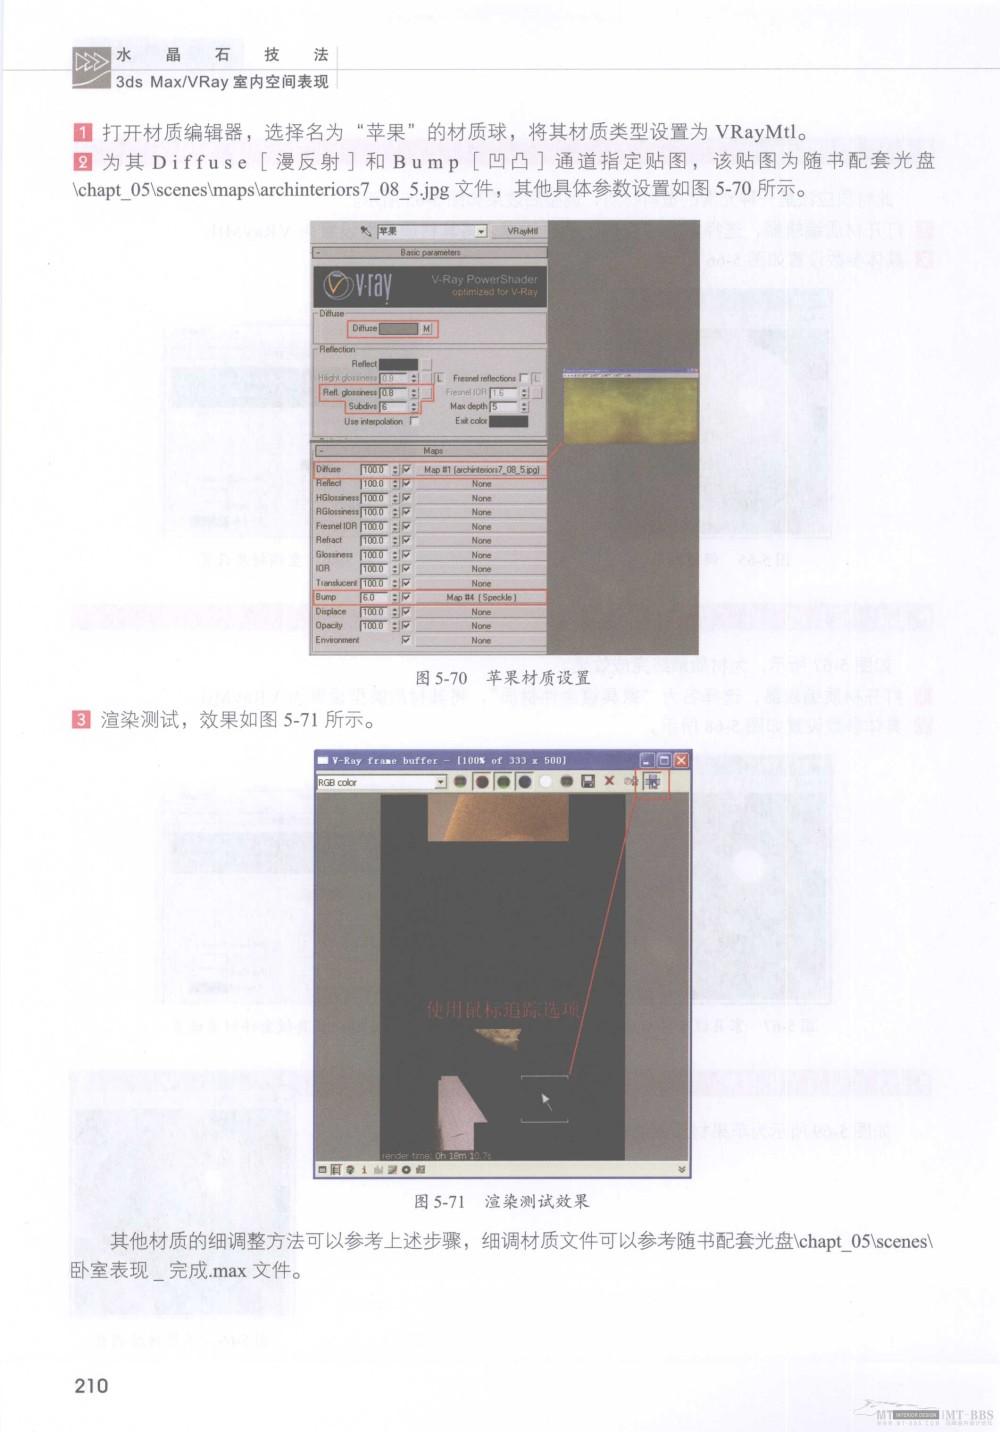 水晶石技法-3ds_Max&VRay室内空间表现_水晶石技法-3ds_Max&VRay室内空间表现_页面_216.jpg